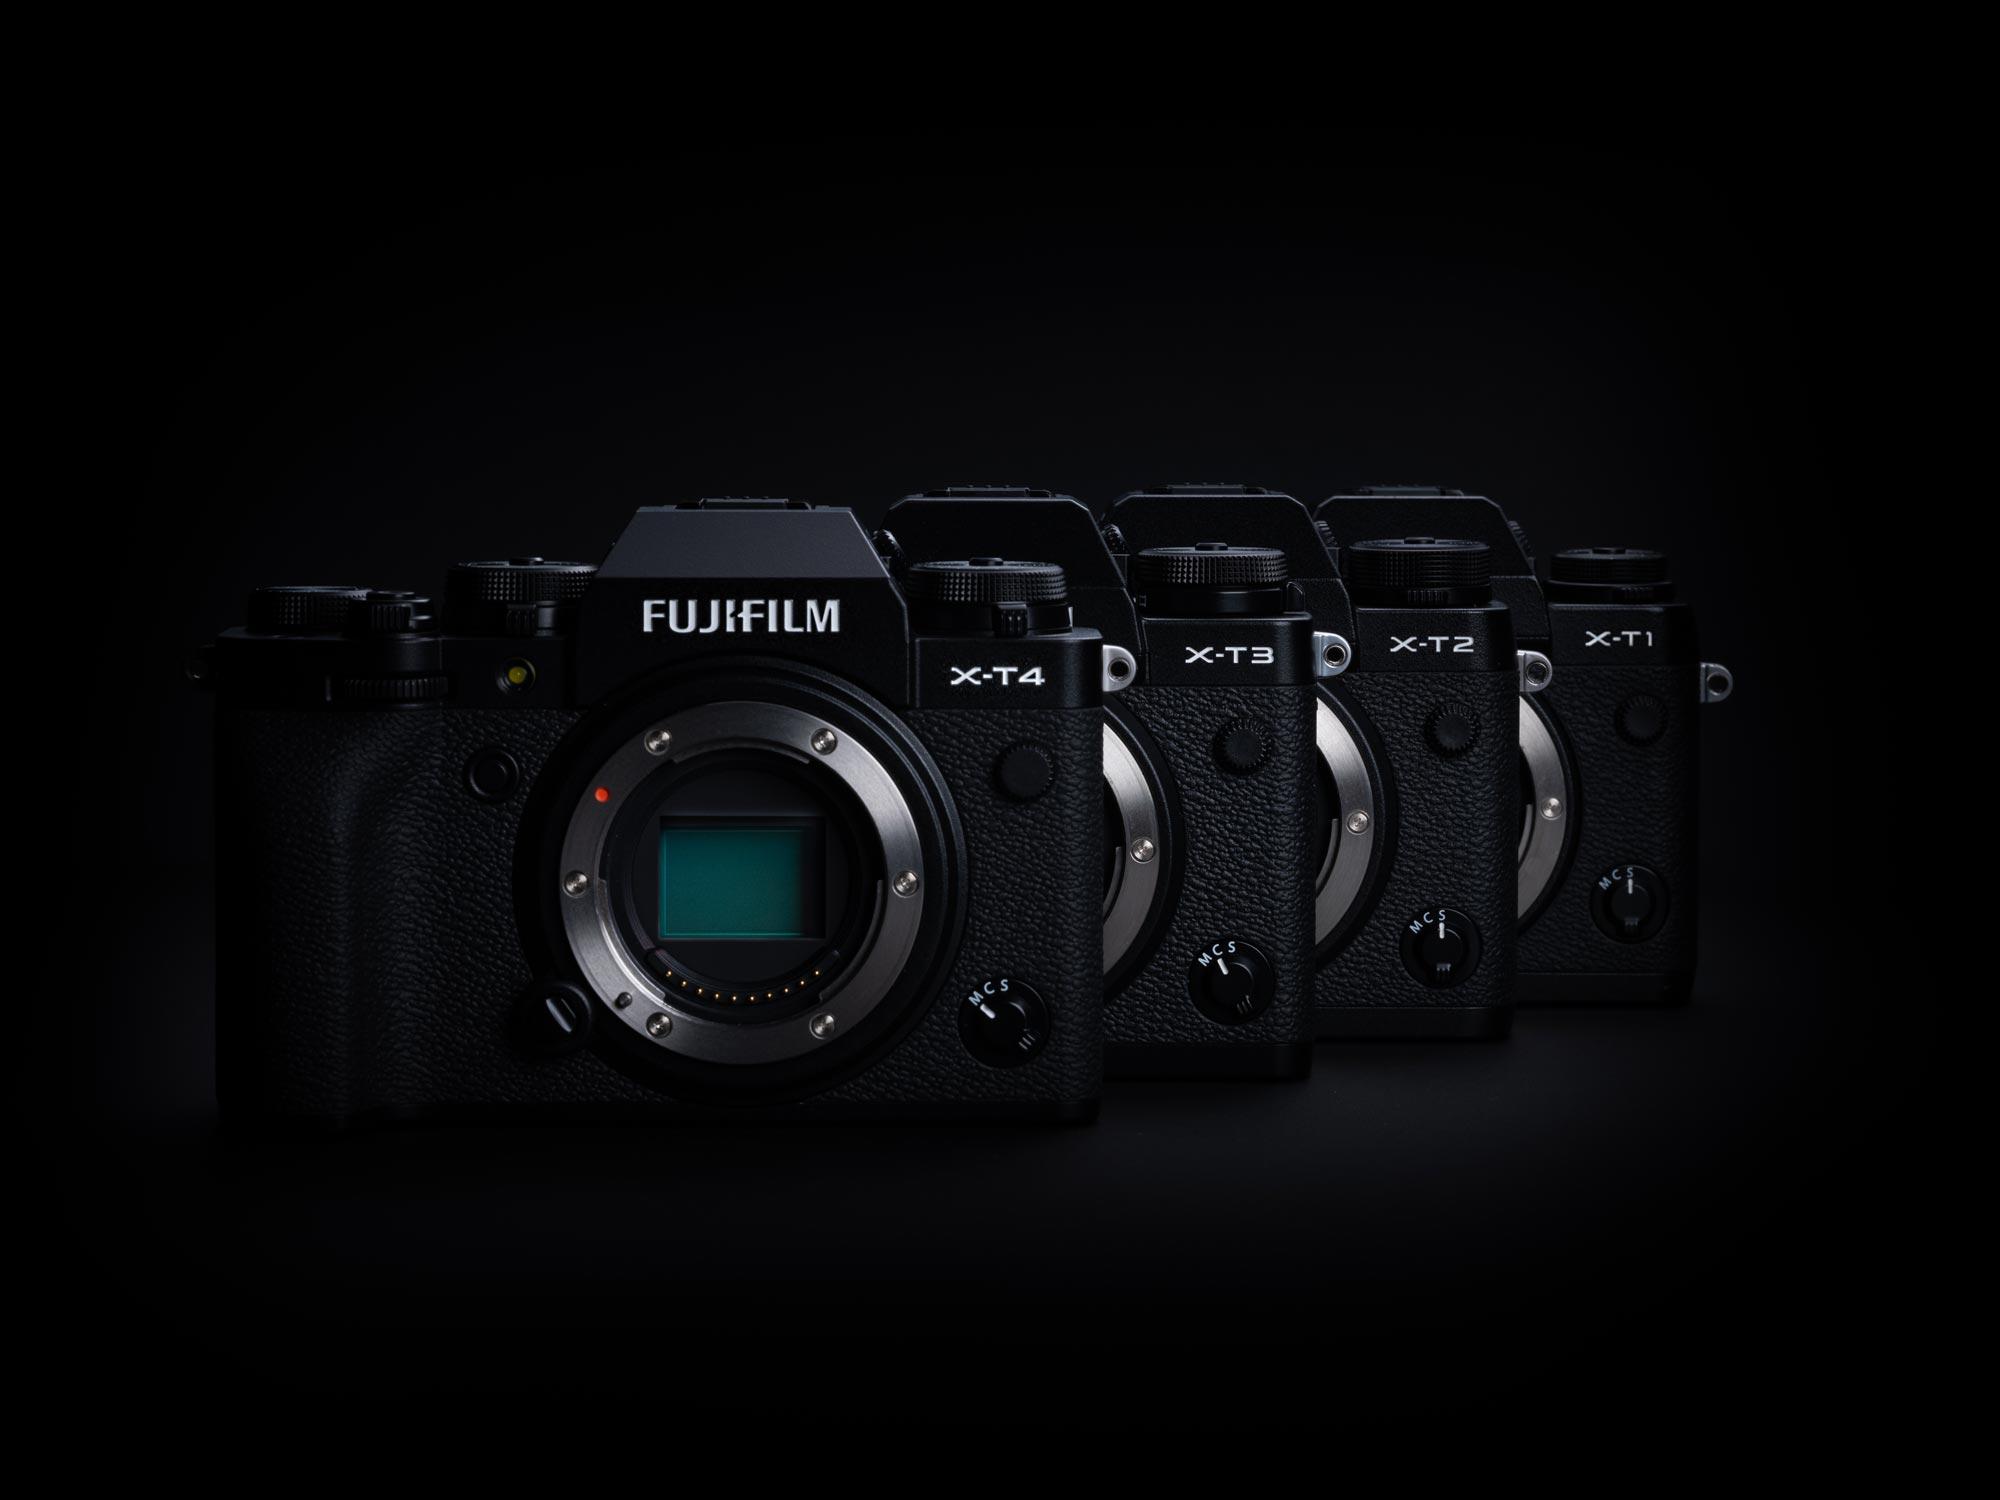 fujifilm-x-t4-generation